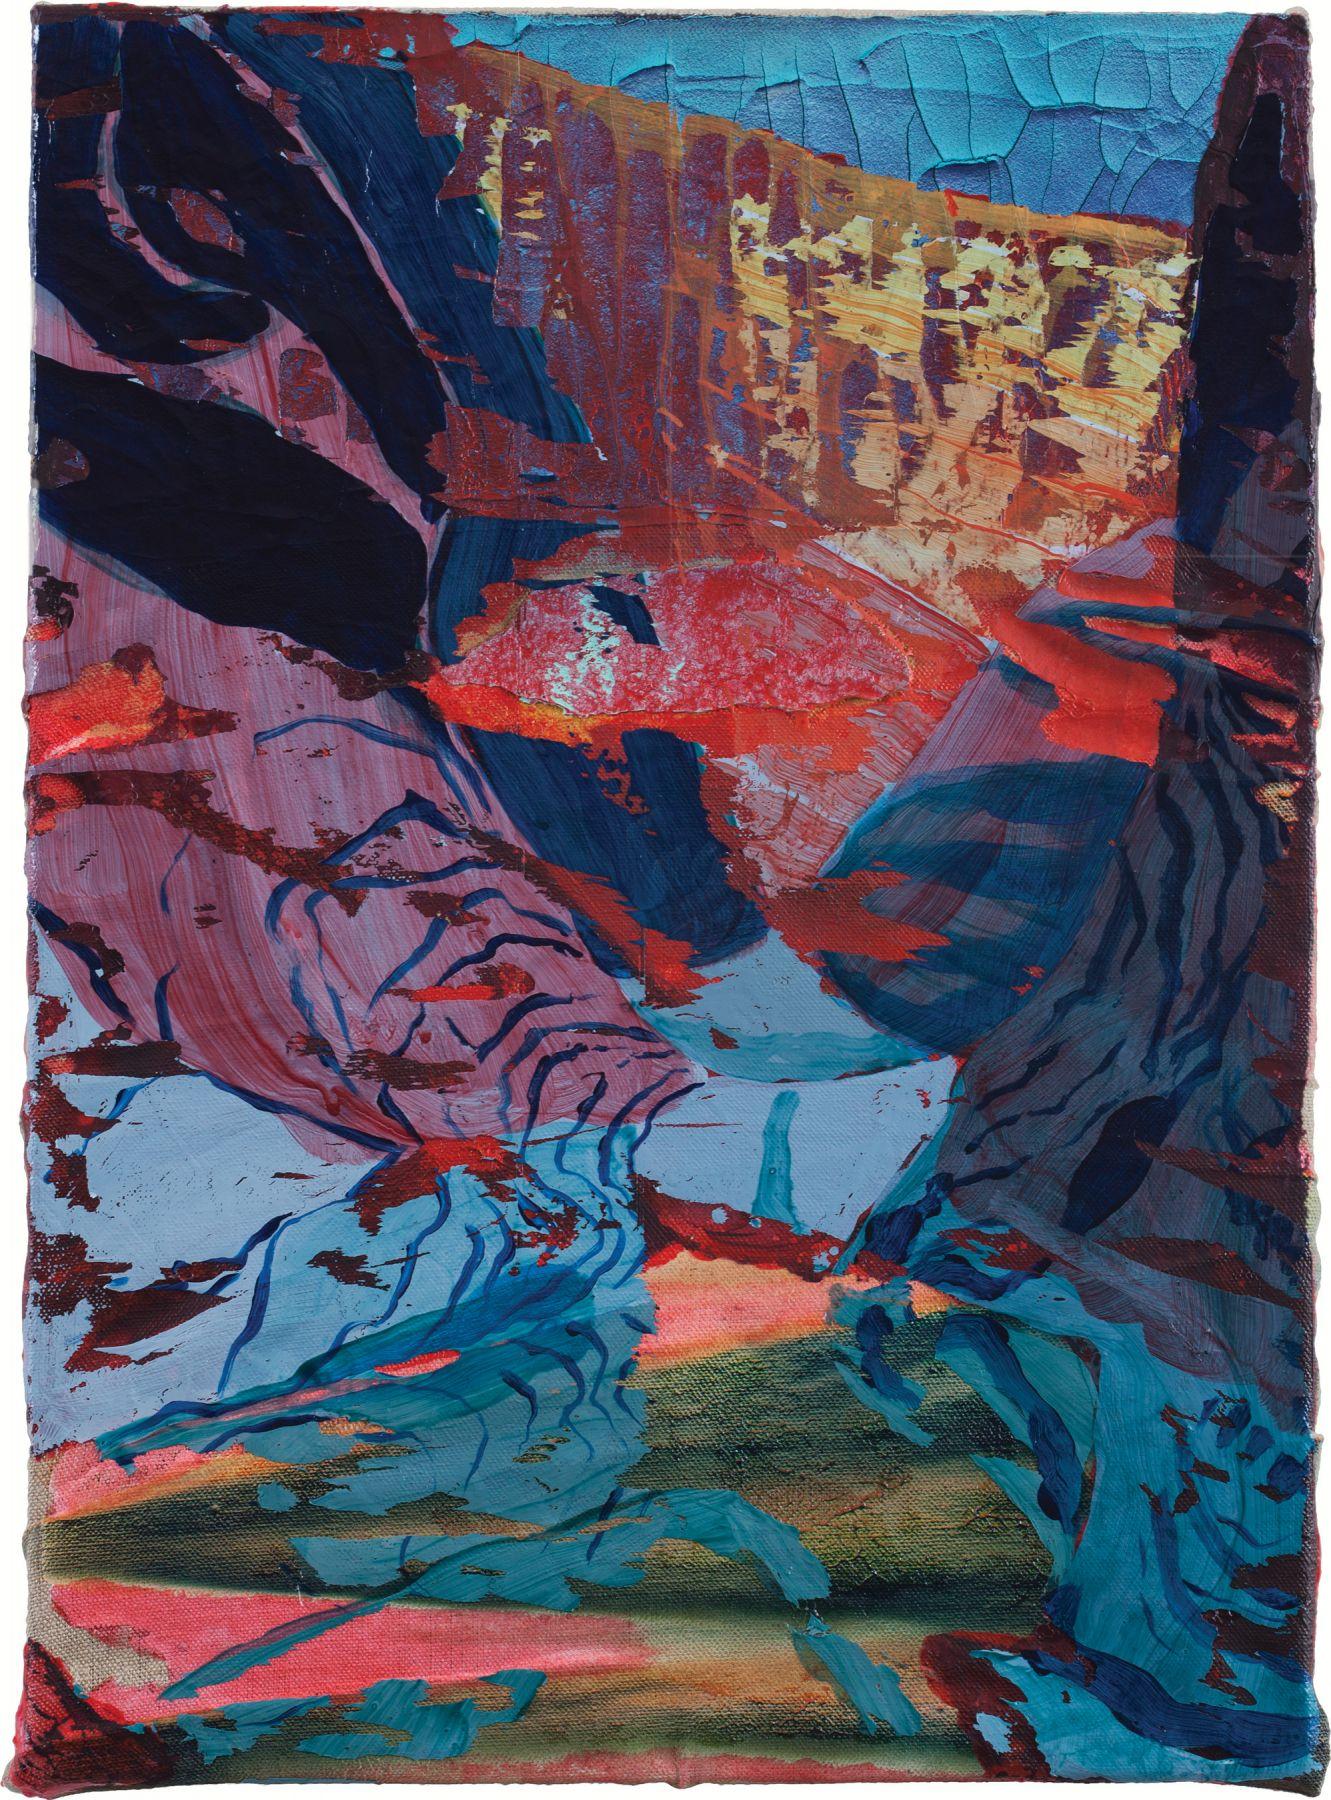 Kimo Nelson, Untitled (GC-01), 2016